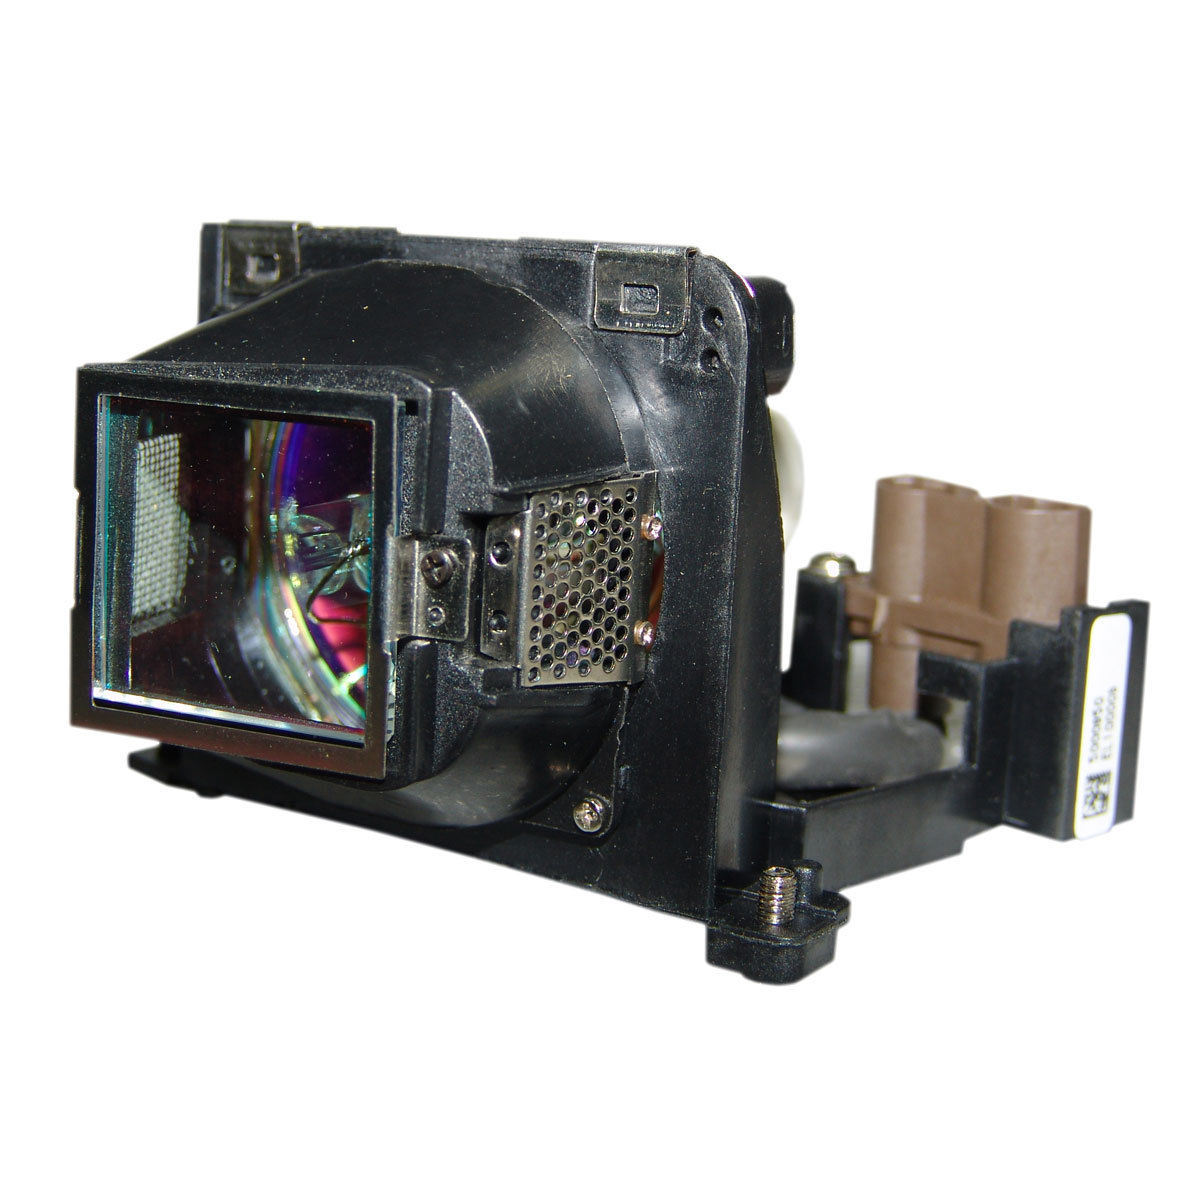 Projector Lamp Bulb VLT-XD205LP VLTXD205LP XD205LP for Mitsubishi SD205 SD205R SD205U XD205 XD205U XD205R XD205U-G with housing mitsubishi 100% mds r v1 80 mds r v1 80